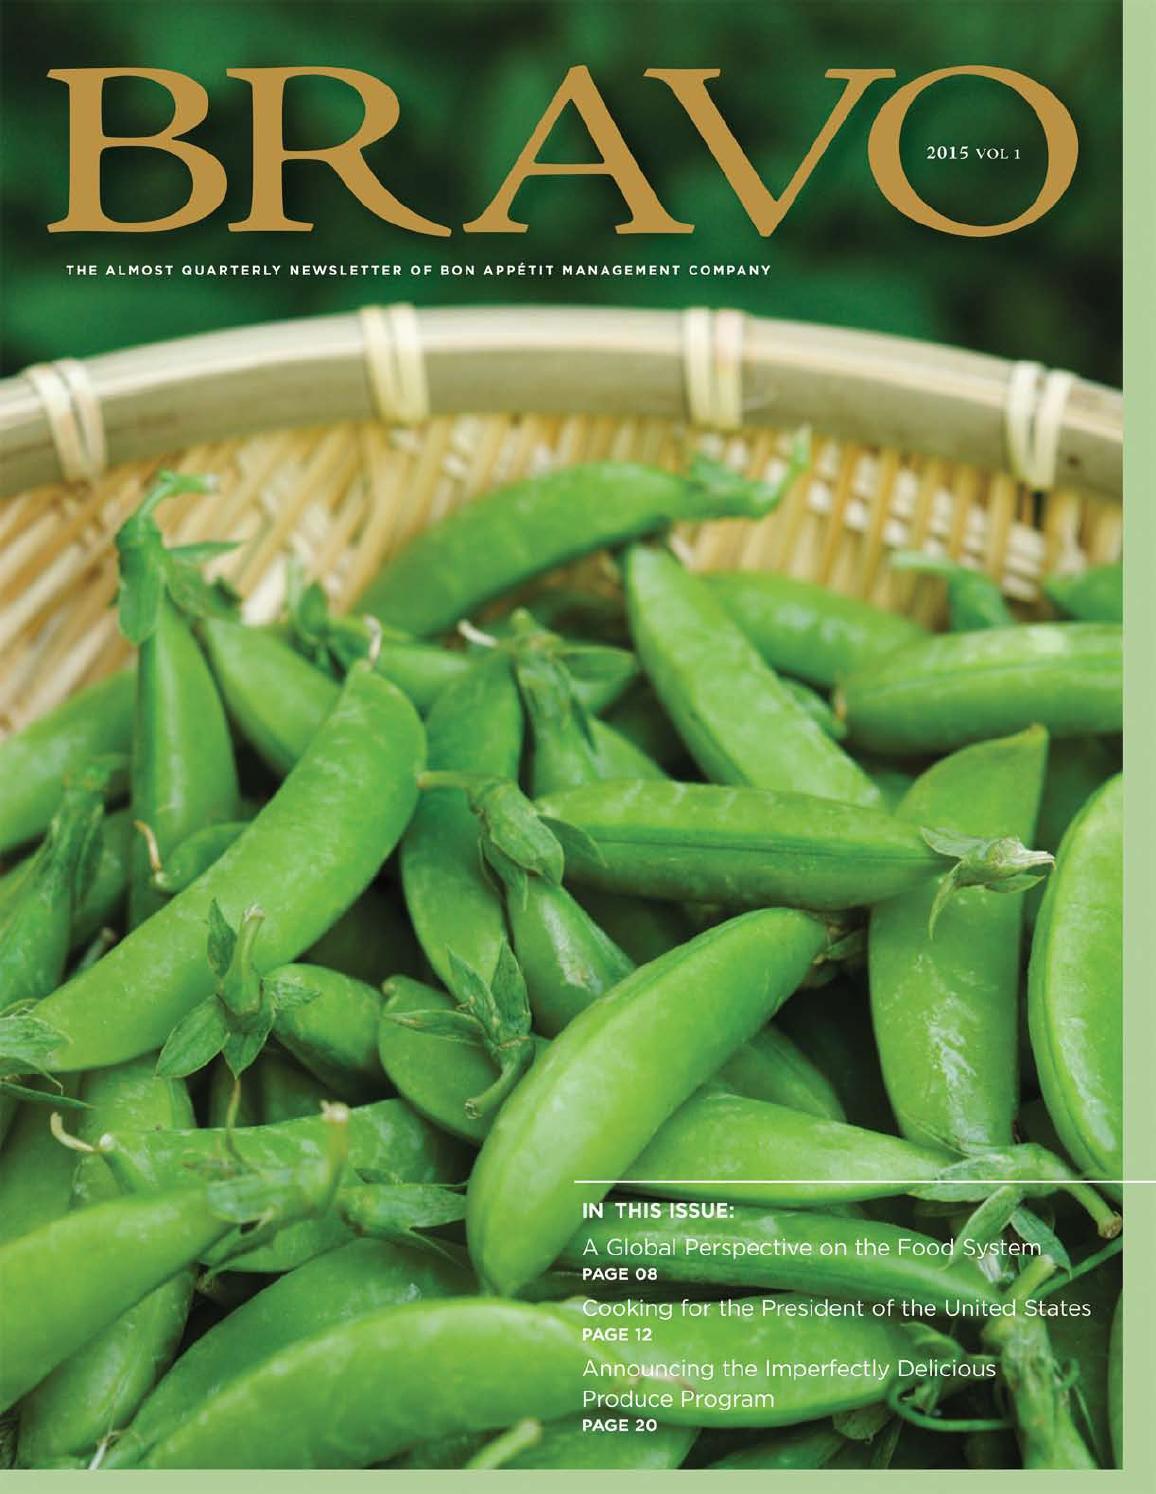 Bravo 2015 - Volume 1 by Compass Group USA - issuu